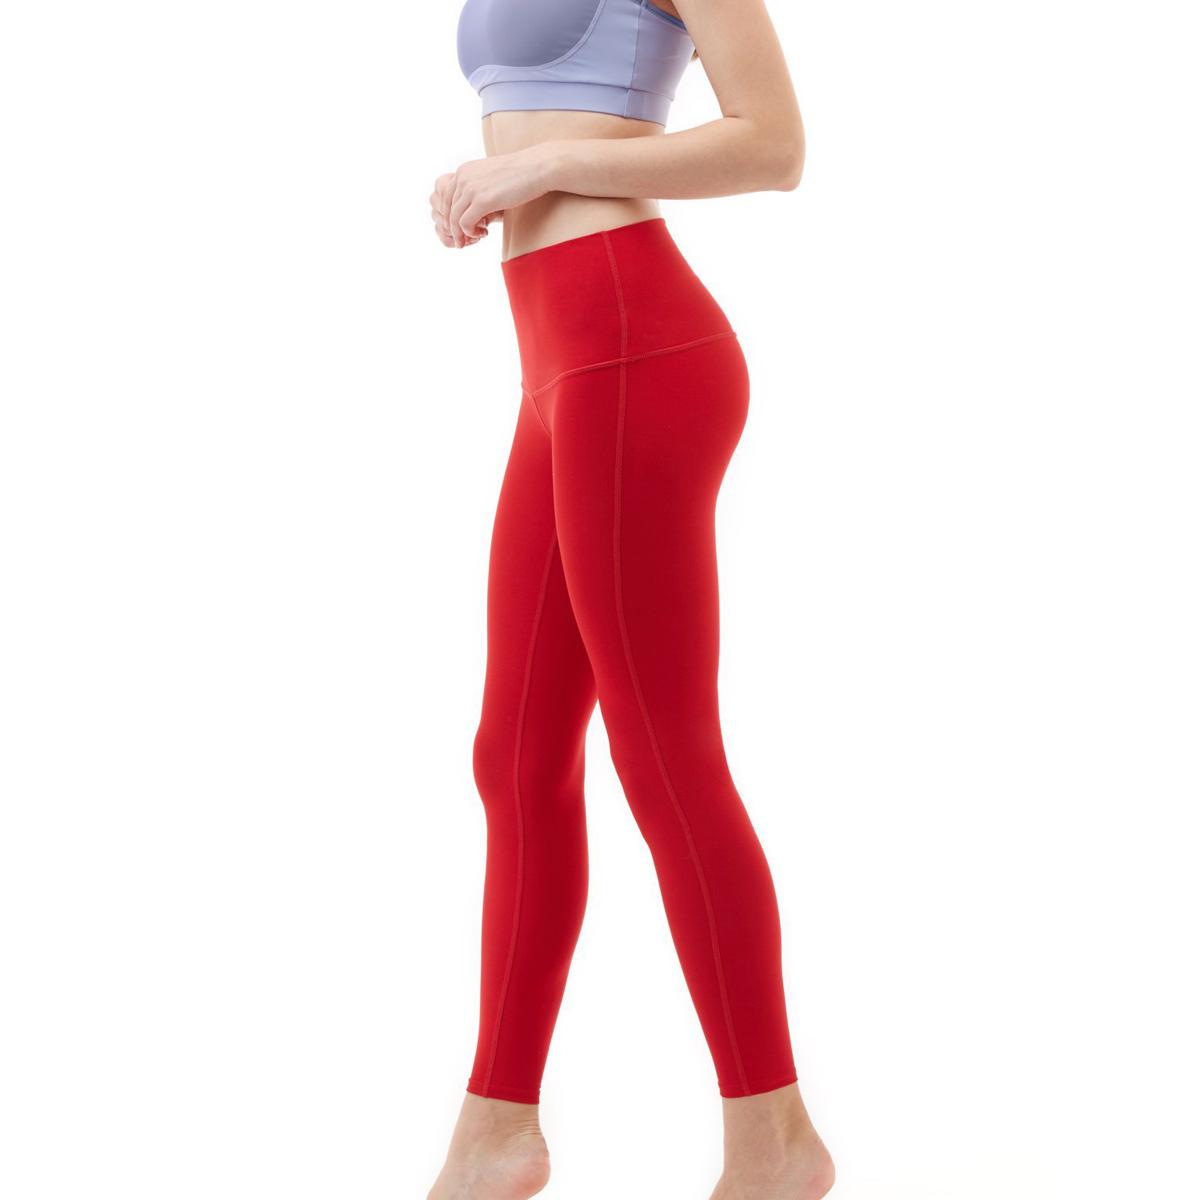 thumbnail 64 - TSLA Tesla FYP42 Women's High-Waisted Ultra-Stretch Tummy Control Yoga Pants